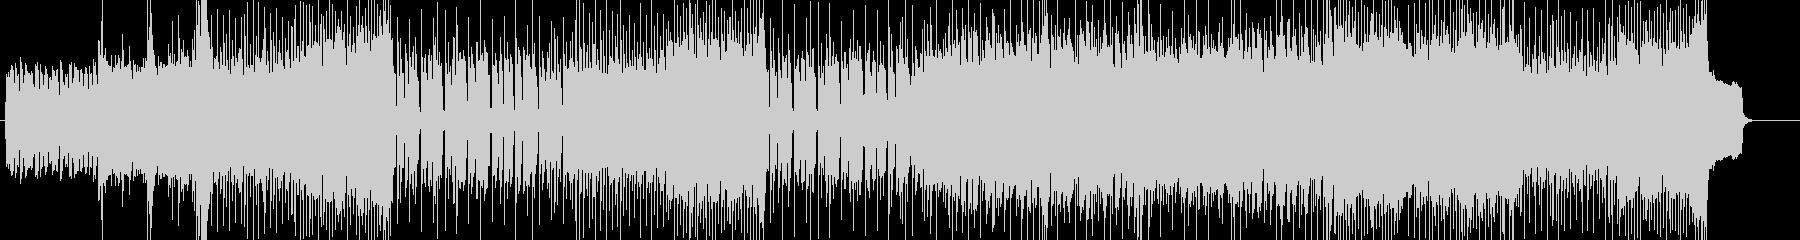 「HR/HM」「ROCK」BGM234の未再生の波形